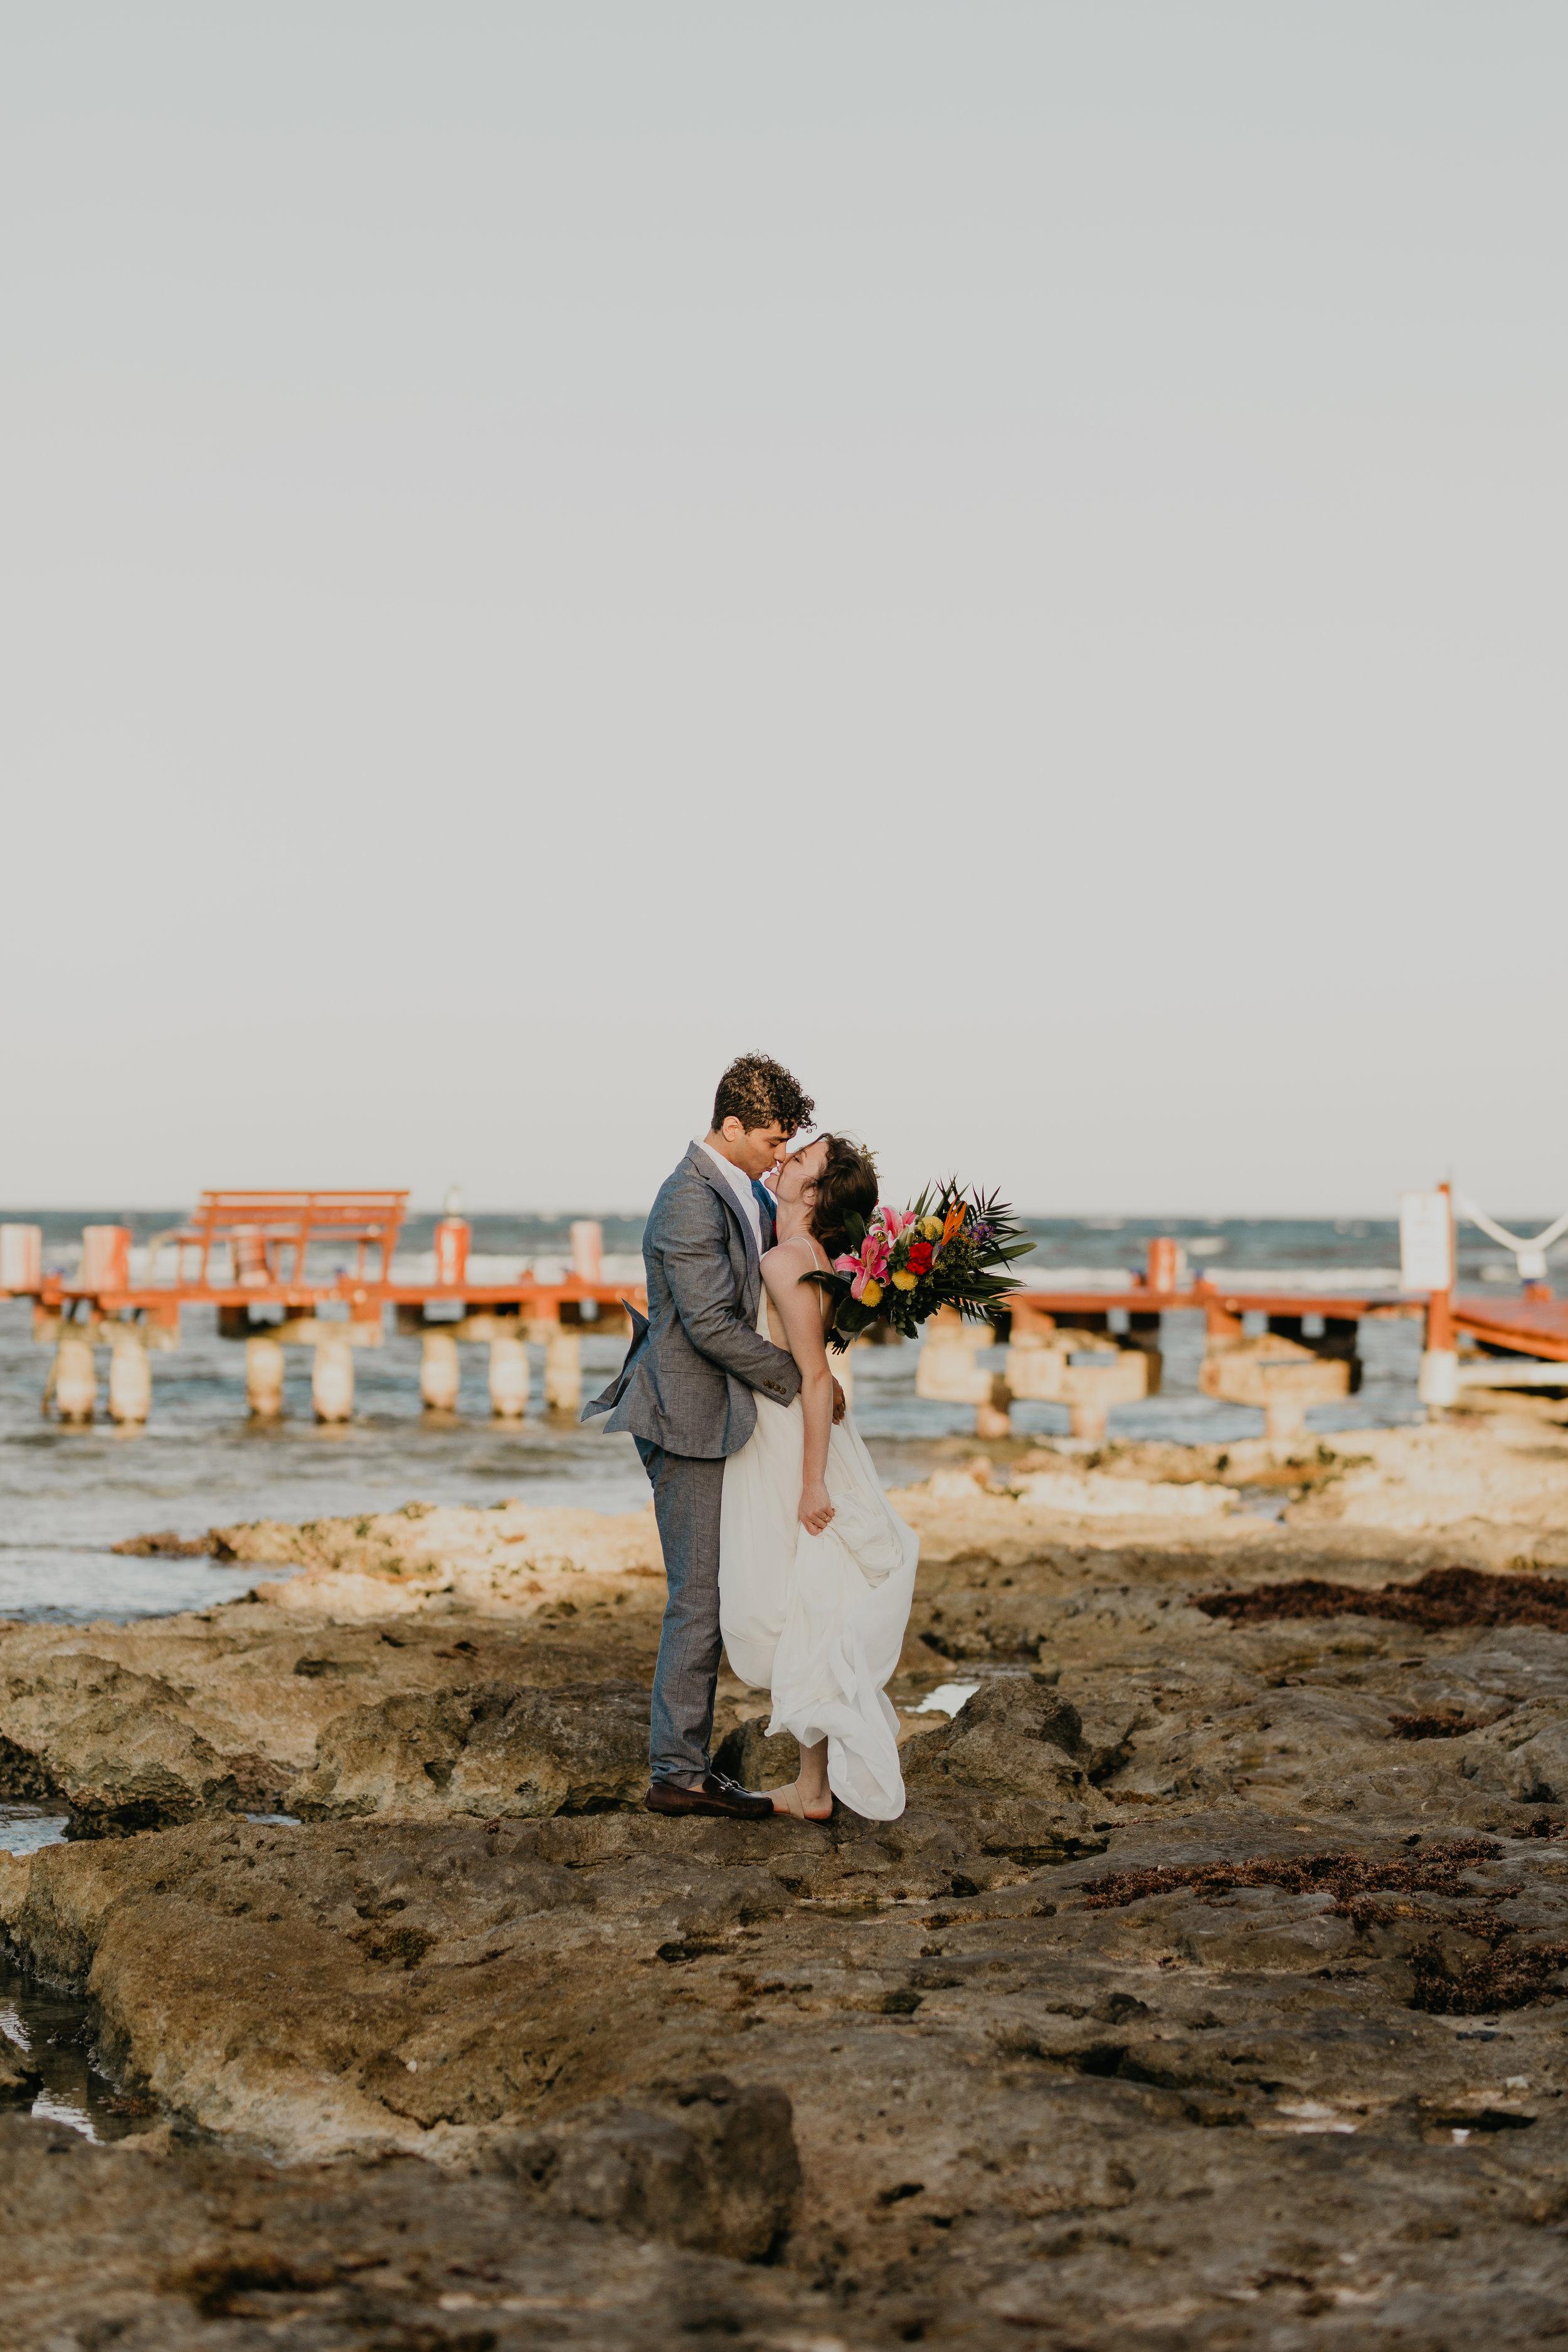 Nicole-Daacke-Photography-beachfront-akumal-destionation-wedding-tulum-mexico-elopement-photographer-destination-wedding-inspiration-sunset-champagne-pop-boho-bride-ocean-tropical-bohemian-tulum-wedding-photos-181.jpg